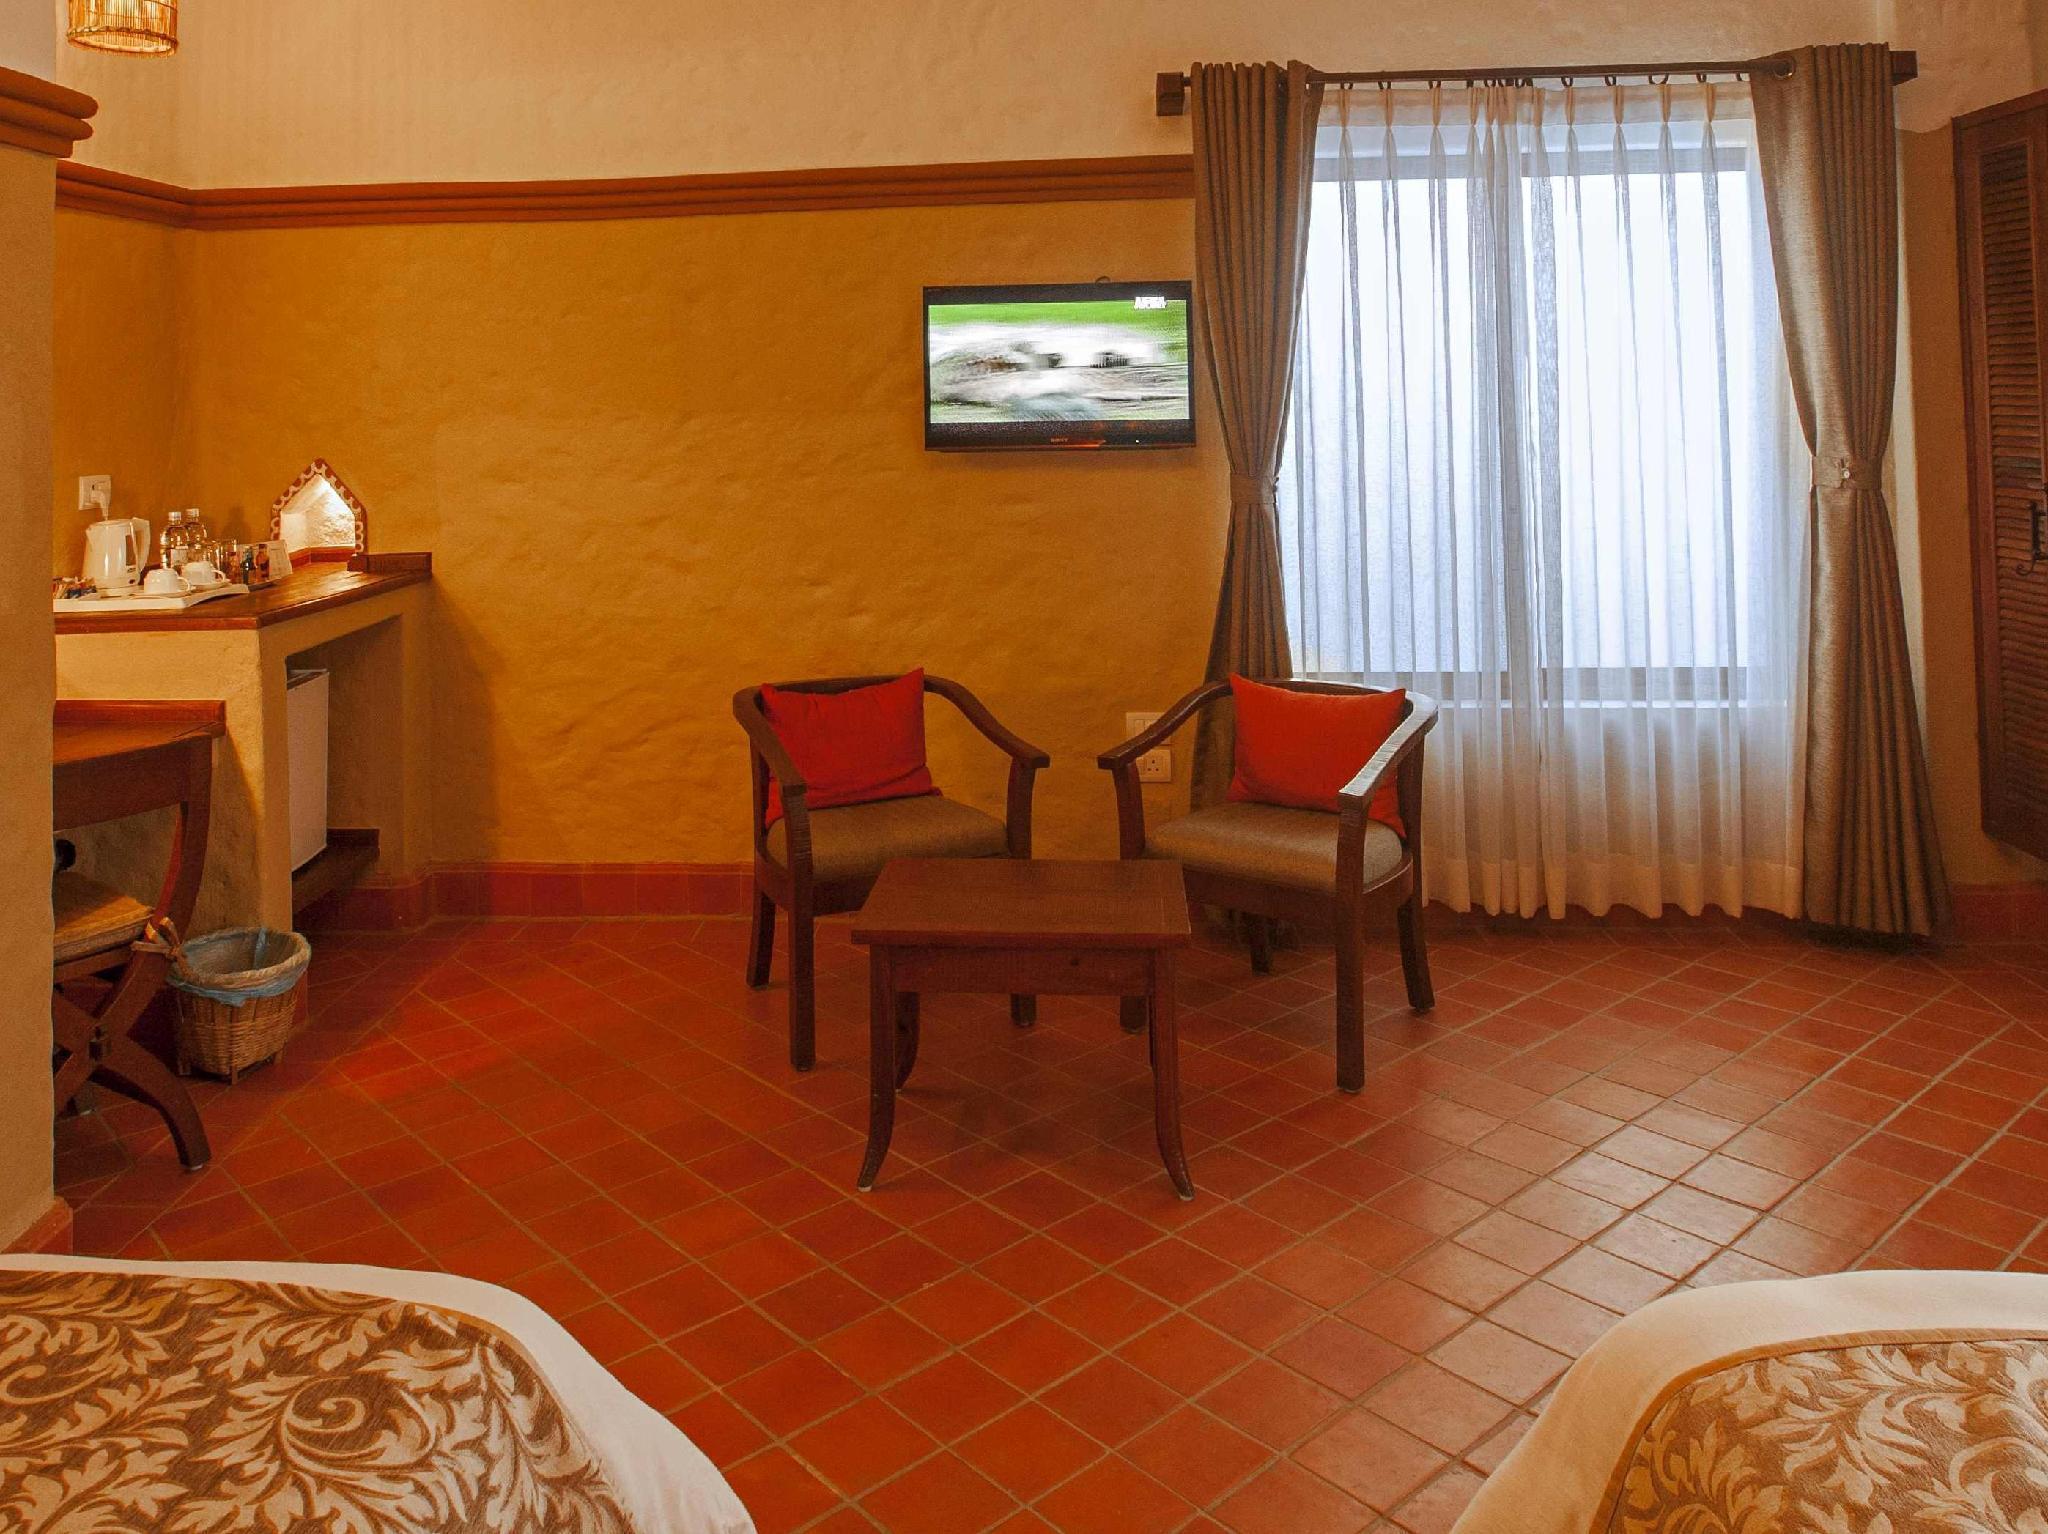 🟊🟊🟊🟊🟊 Green Park Resort Chitwan - Chitwan - Nepal